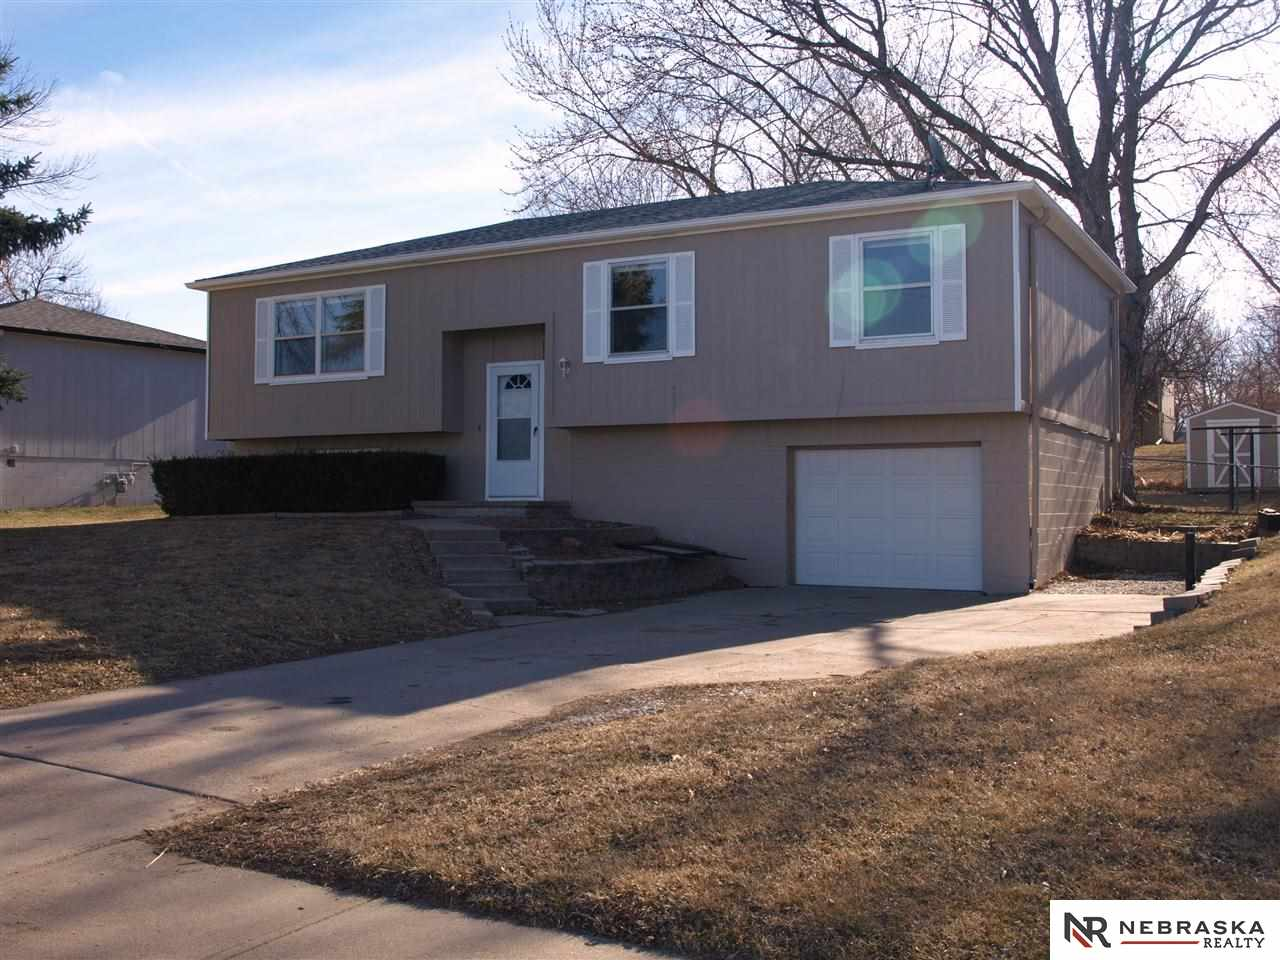 Real Estate for Sale, ListingId: 32324925, Springfield,NE68059